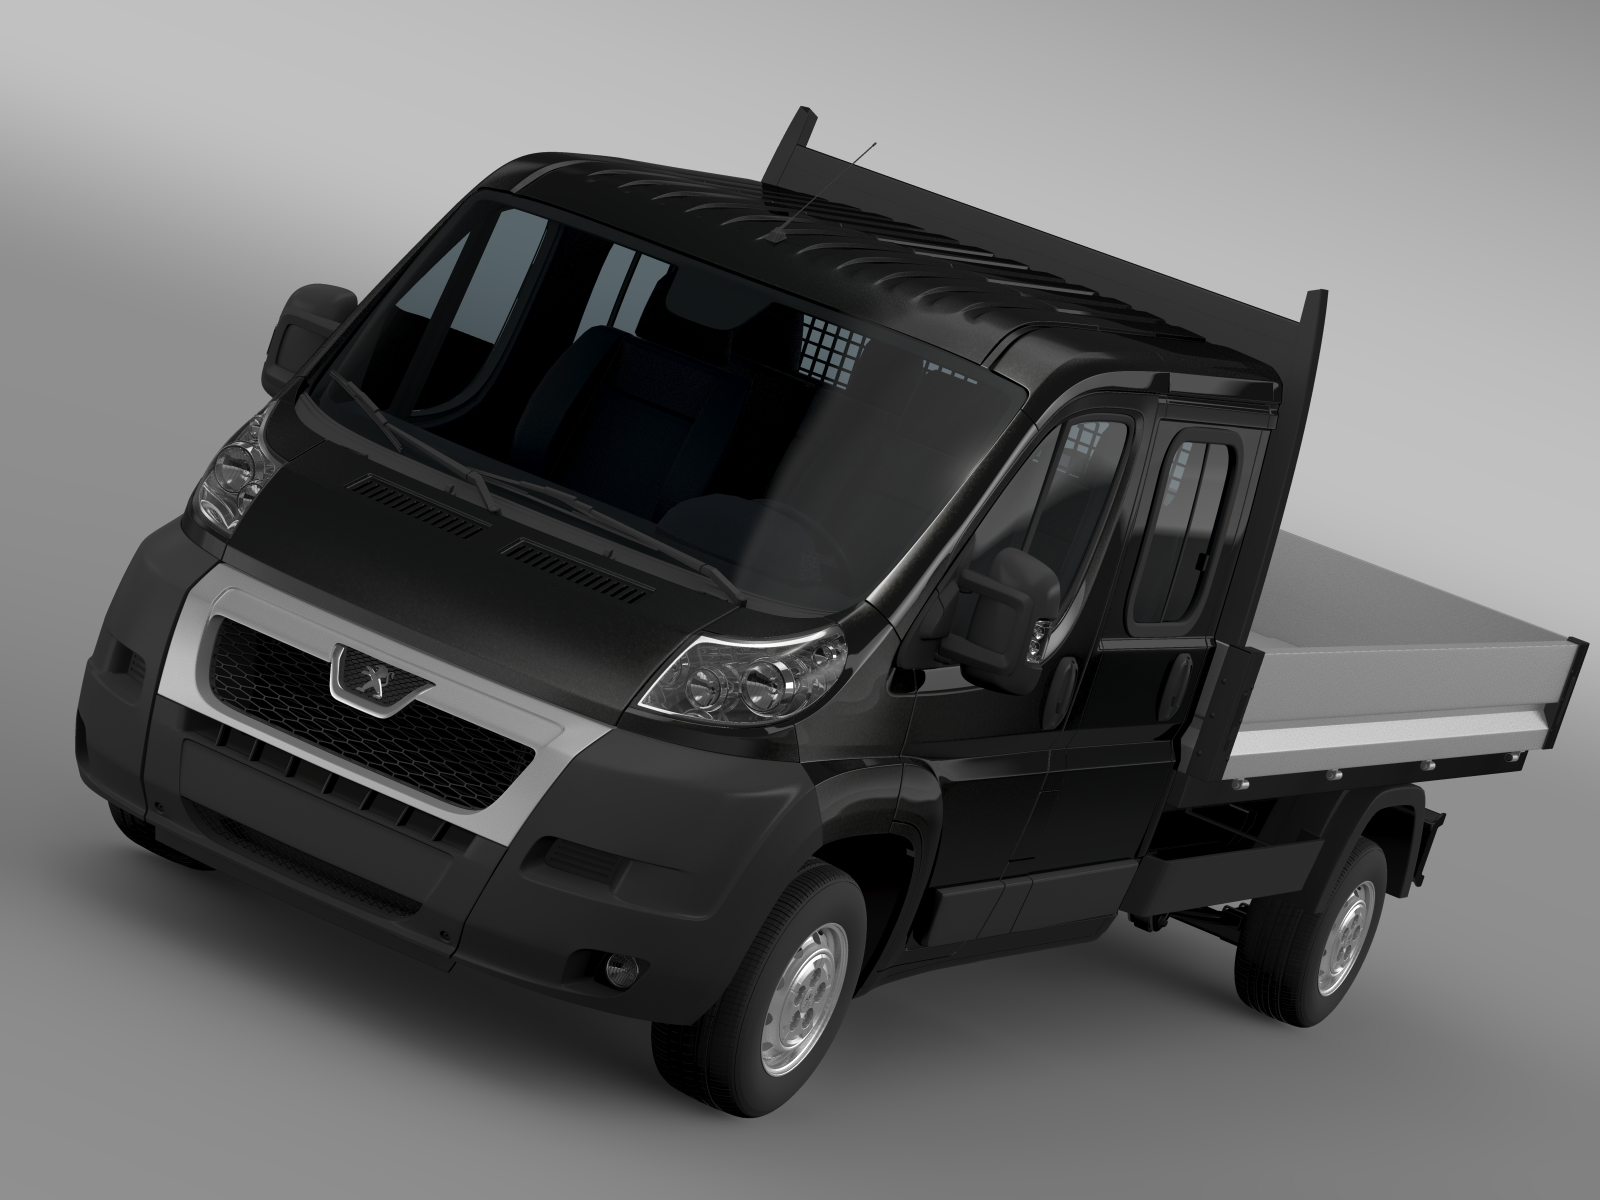 peugeot boxer crew cab truck 2009-2014 3d model 3ds max fbx c4d lwo ma mb hrc xsi obj 218781